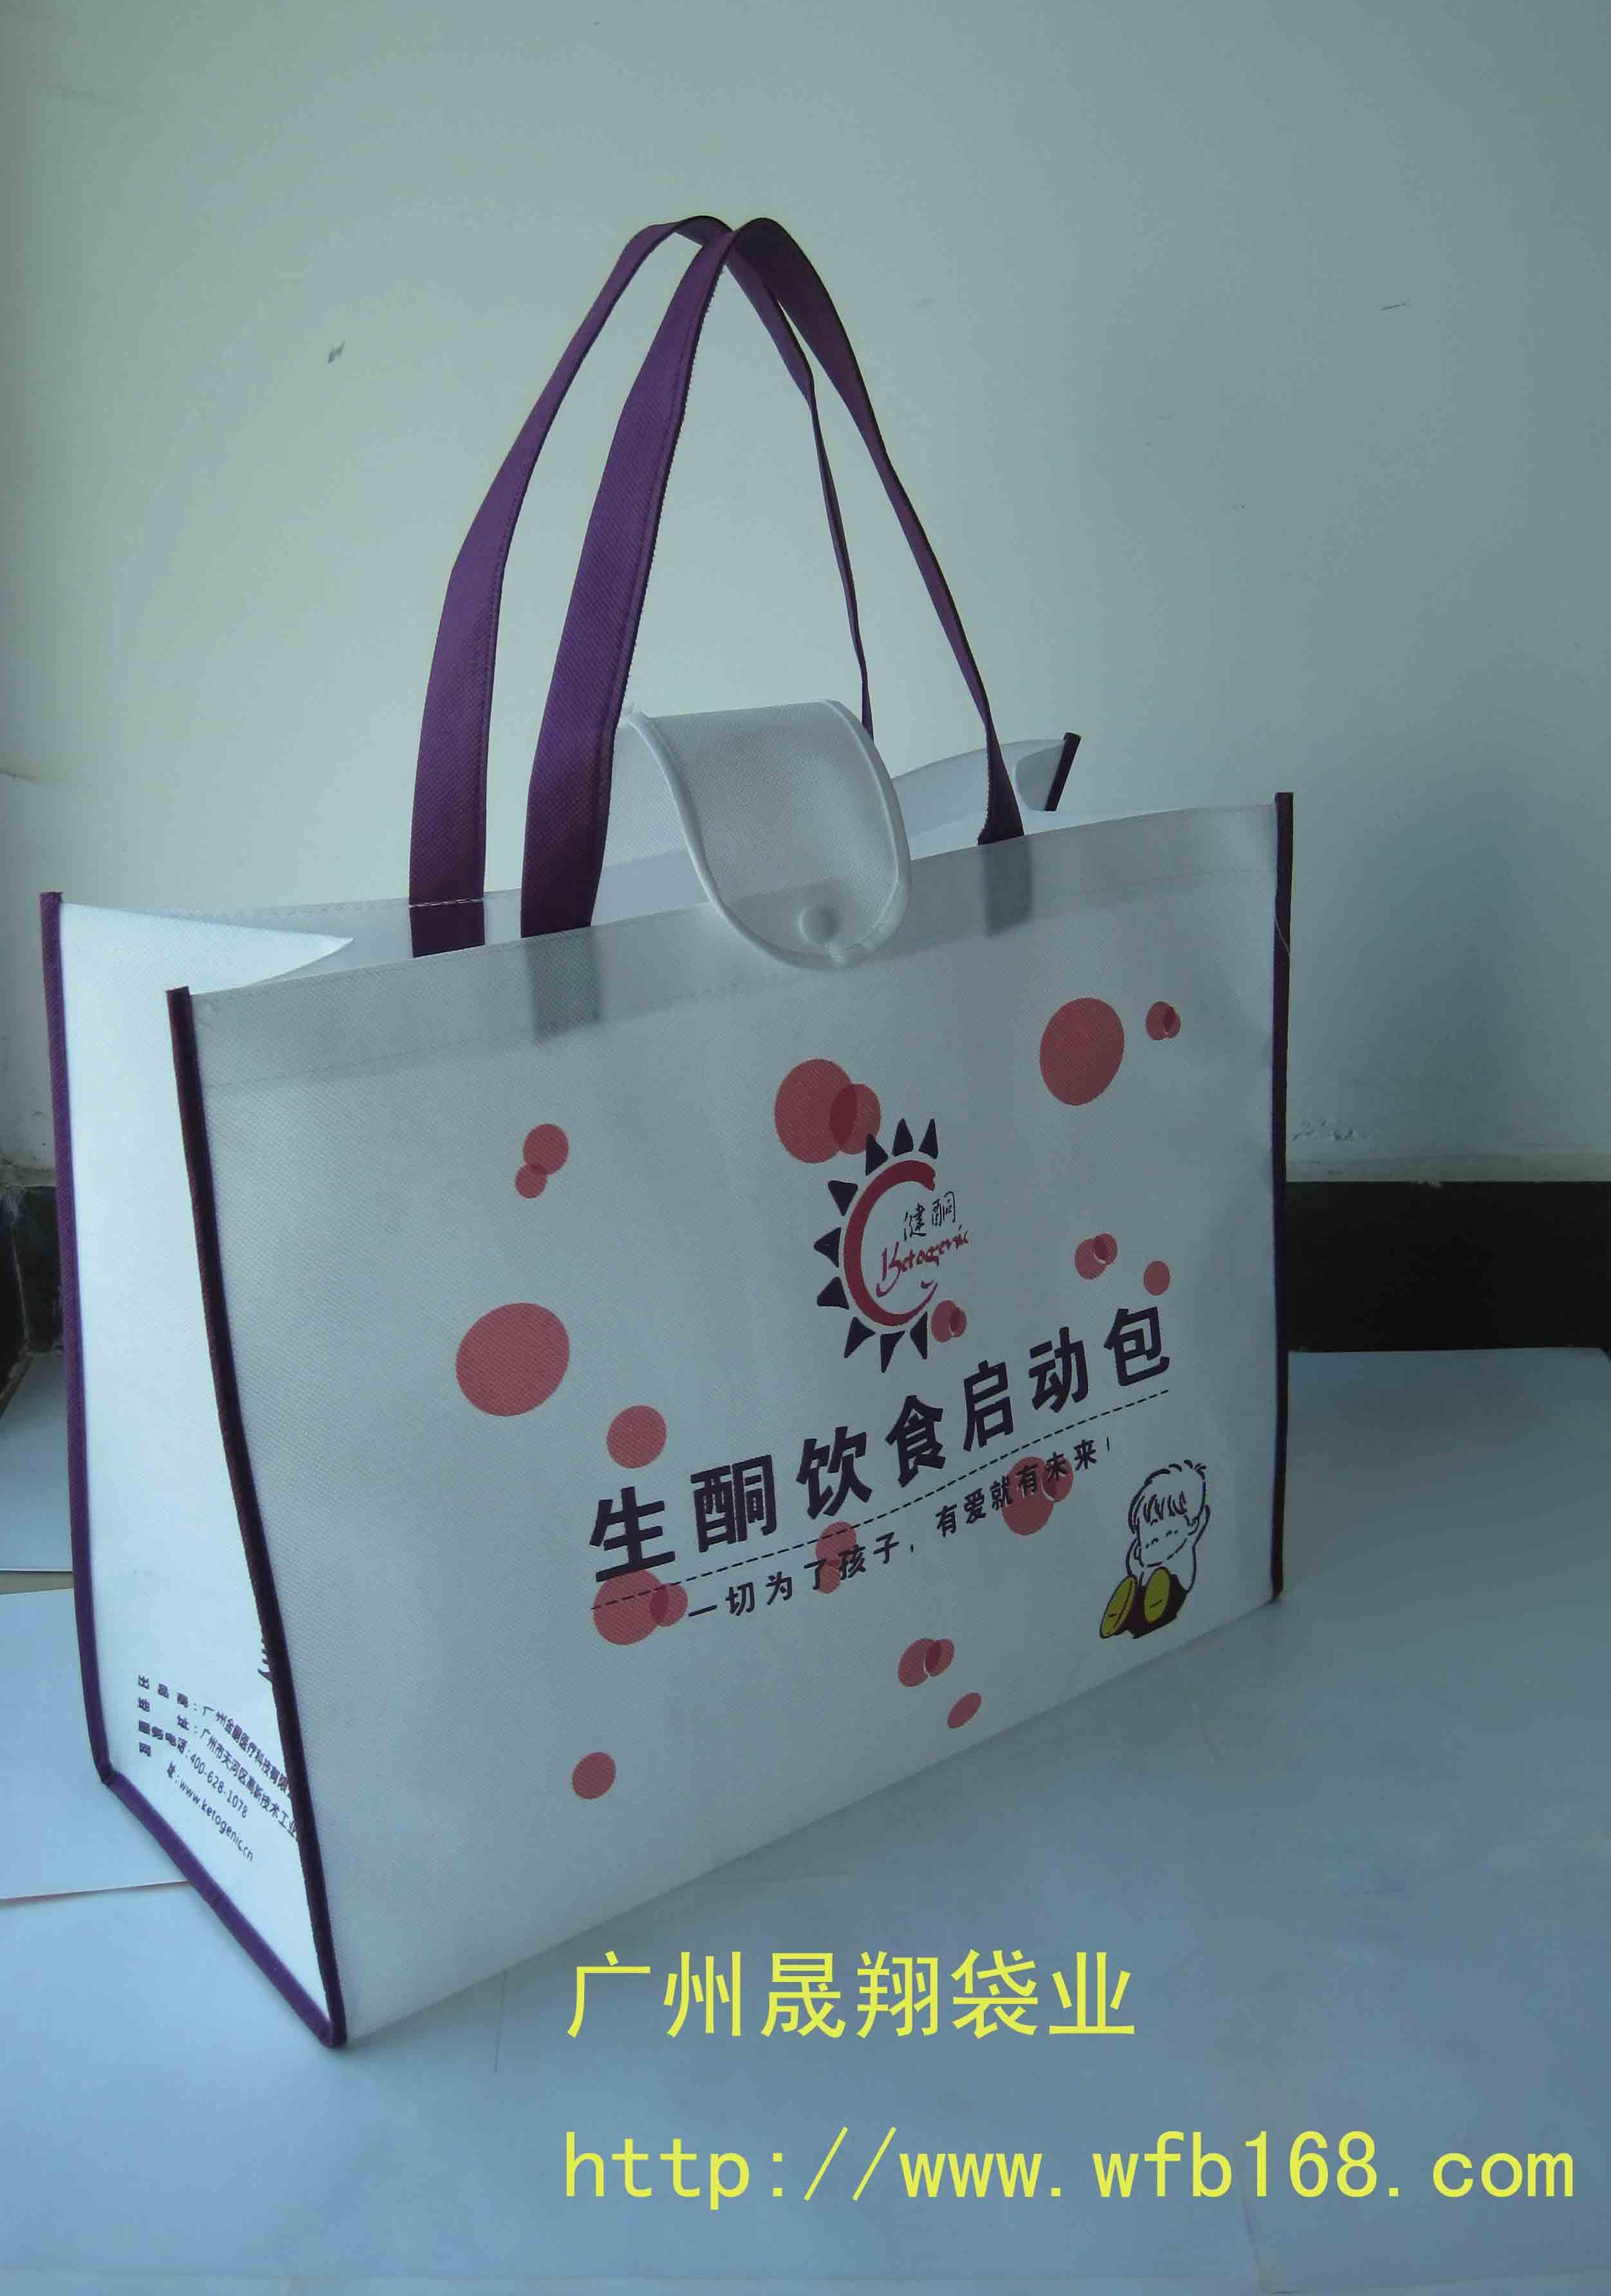 "<p>广州晟翔袋业是一家集产品开发,生产,销售于一体。专注于无纺布袋,环保袋,礼品袋,宣传广告袋,无纺布复膜袋,西服套,广告围裙,束口袋,背心袋,茶叶袋,红酒袋,帆布袋,麻布袋等产品的制作。<br /><br />我们注重产品的精益求精及服务的完善性。以 <span style=""font-family:Verdana;"">?"